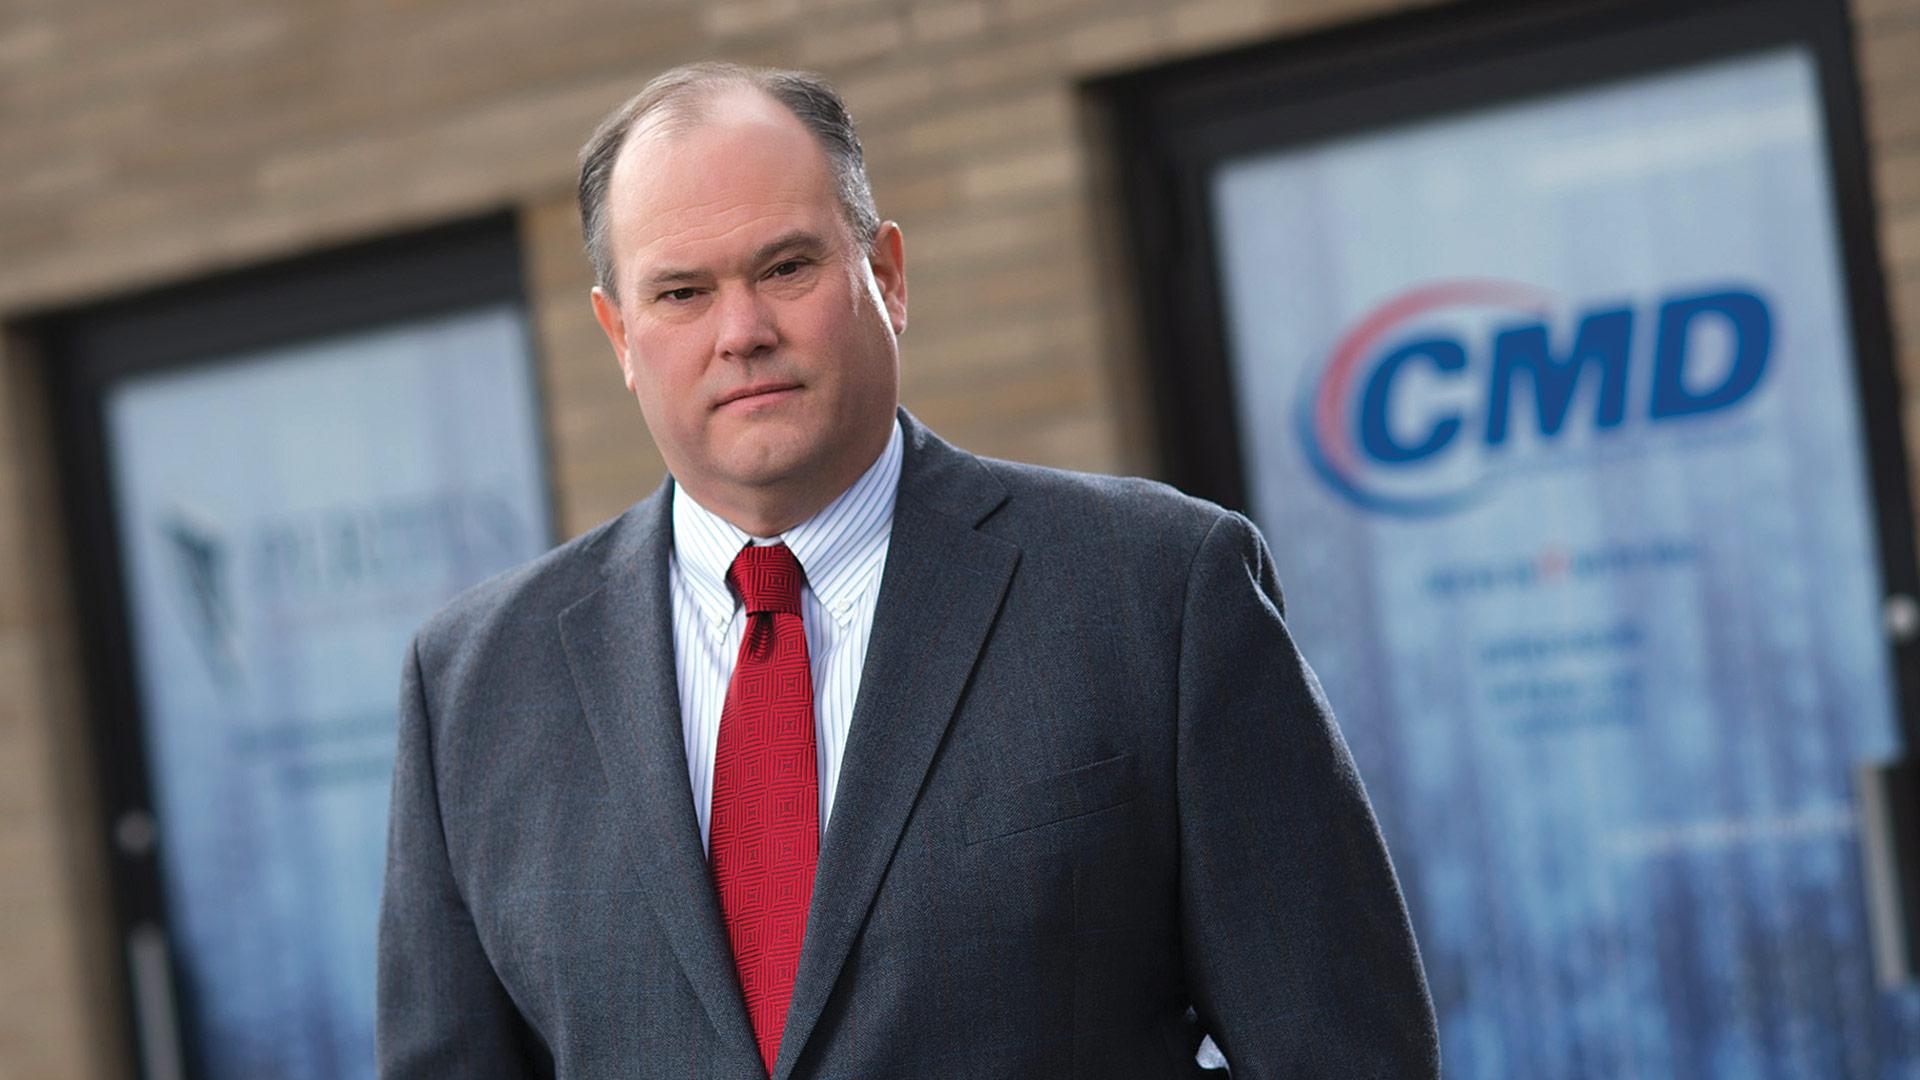 Charlie Christianson